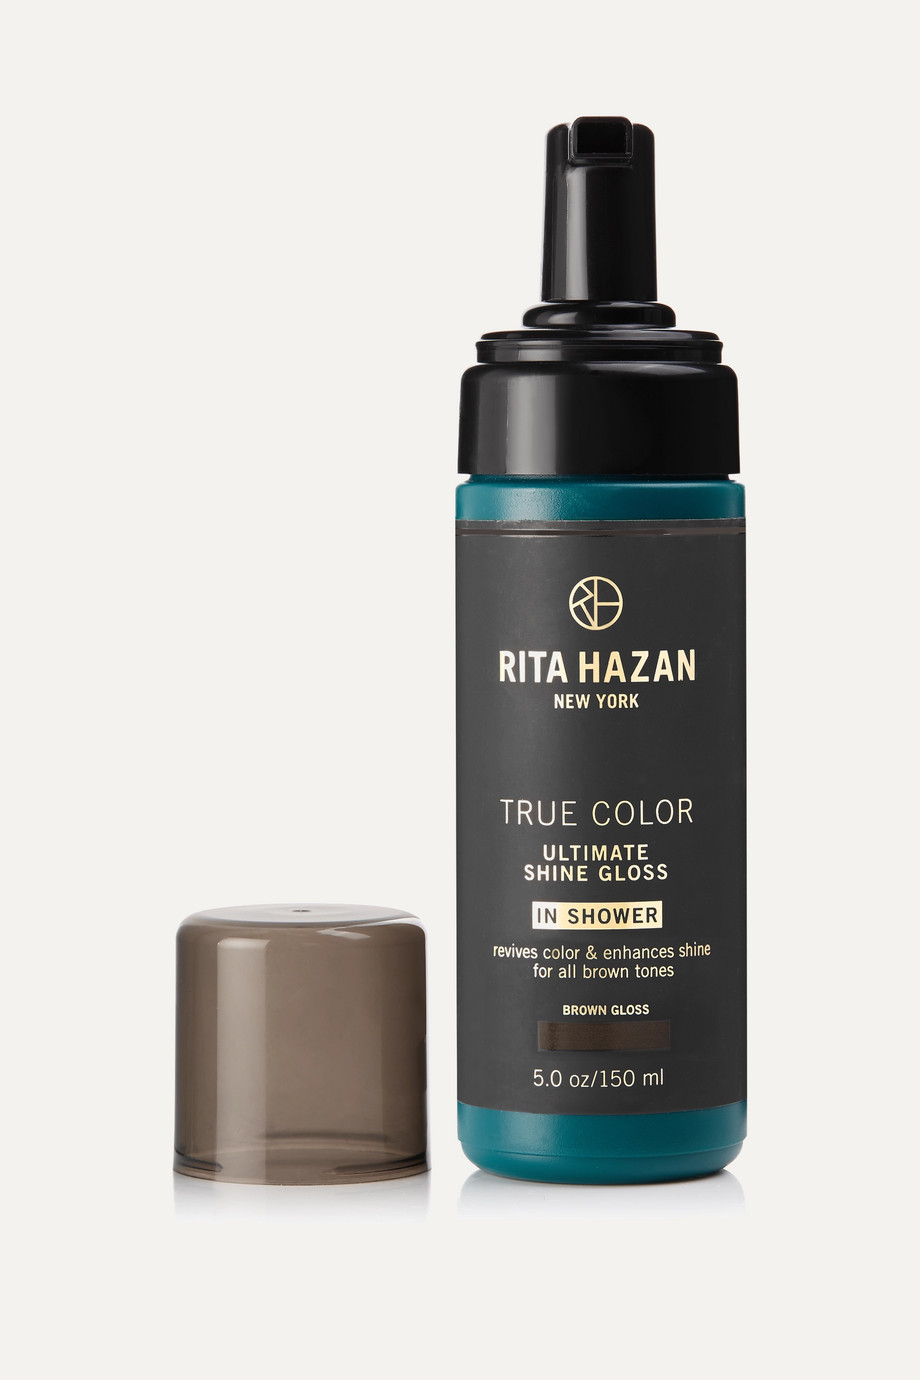 Rita Hazan True Color Ultimate Shine Gloss – Brown, 150 ml – Farbkur